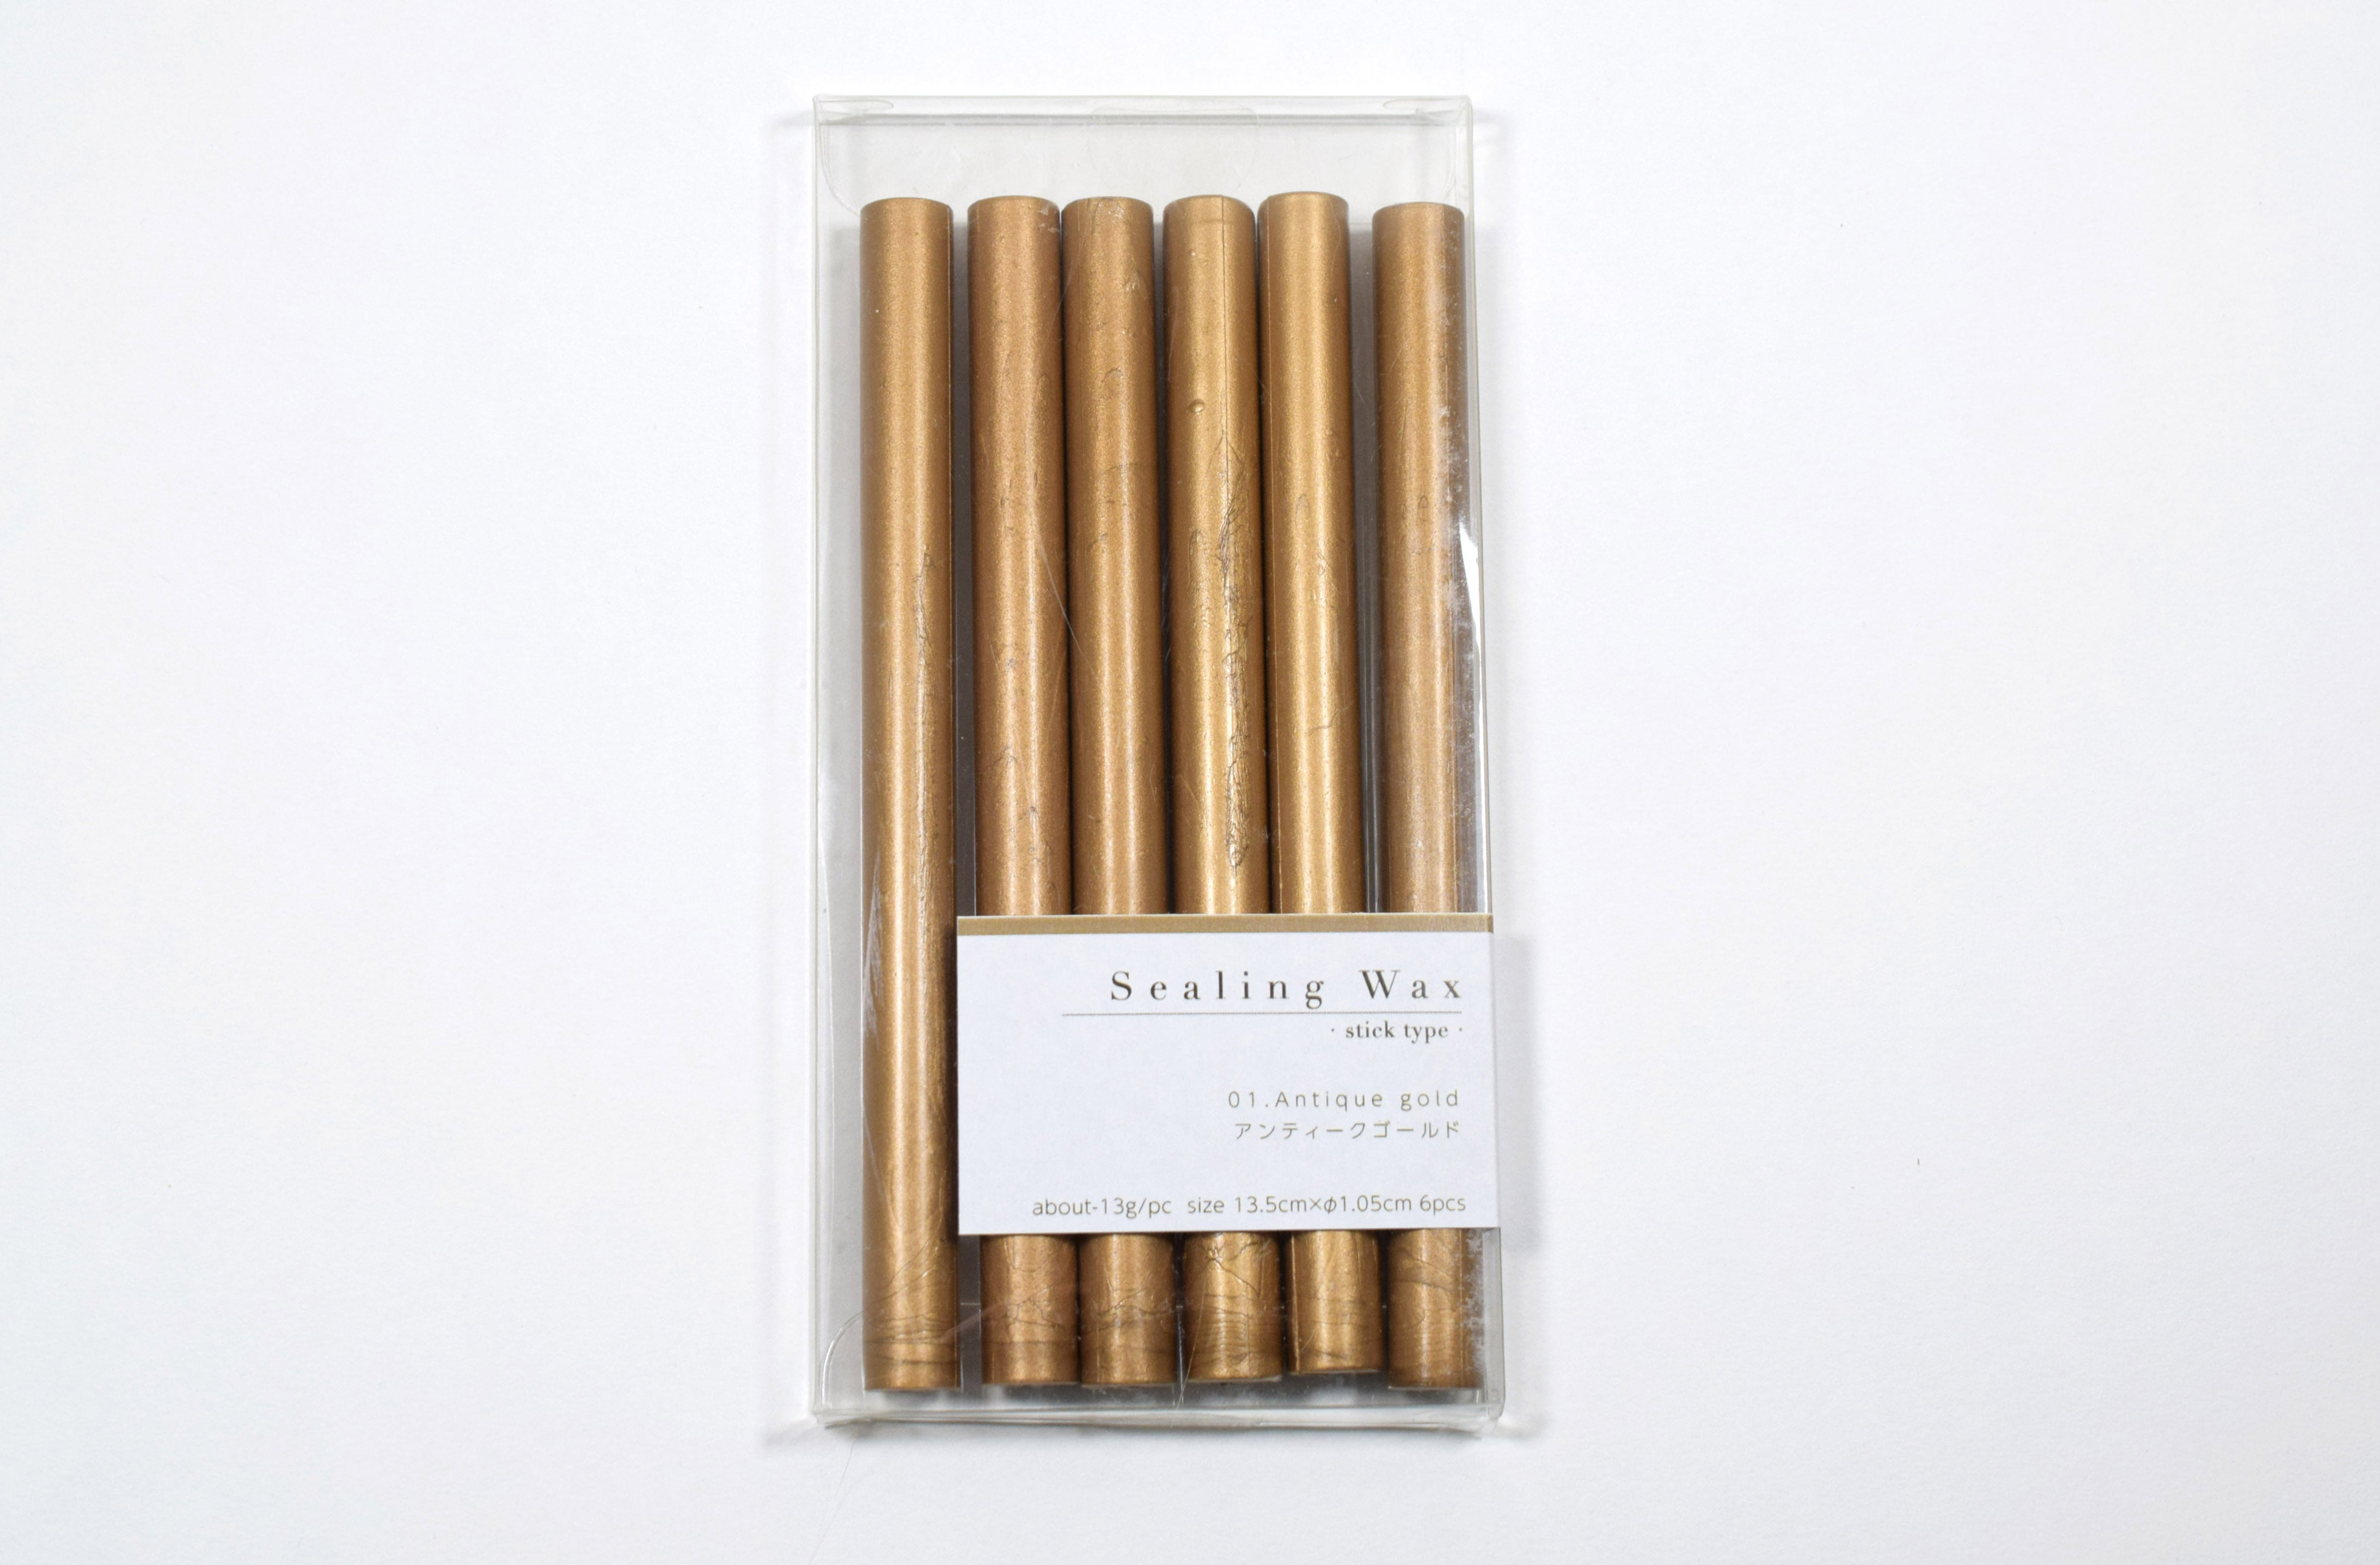 Sealing Wax stick 01.Antique gold シーリングワックス グルーガン用 アンティークゴールド